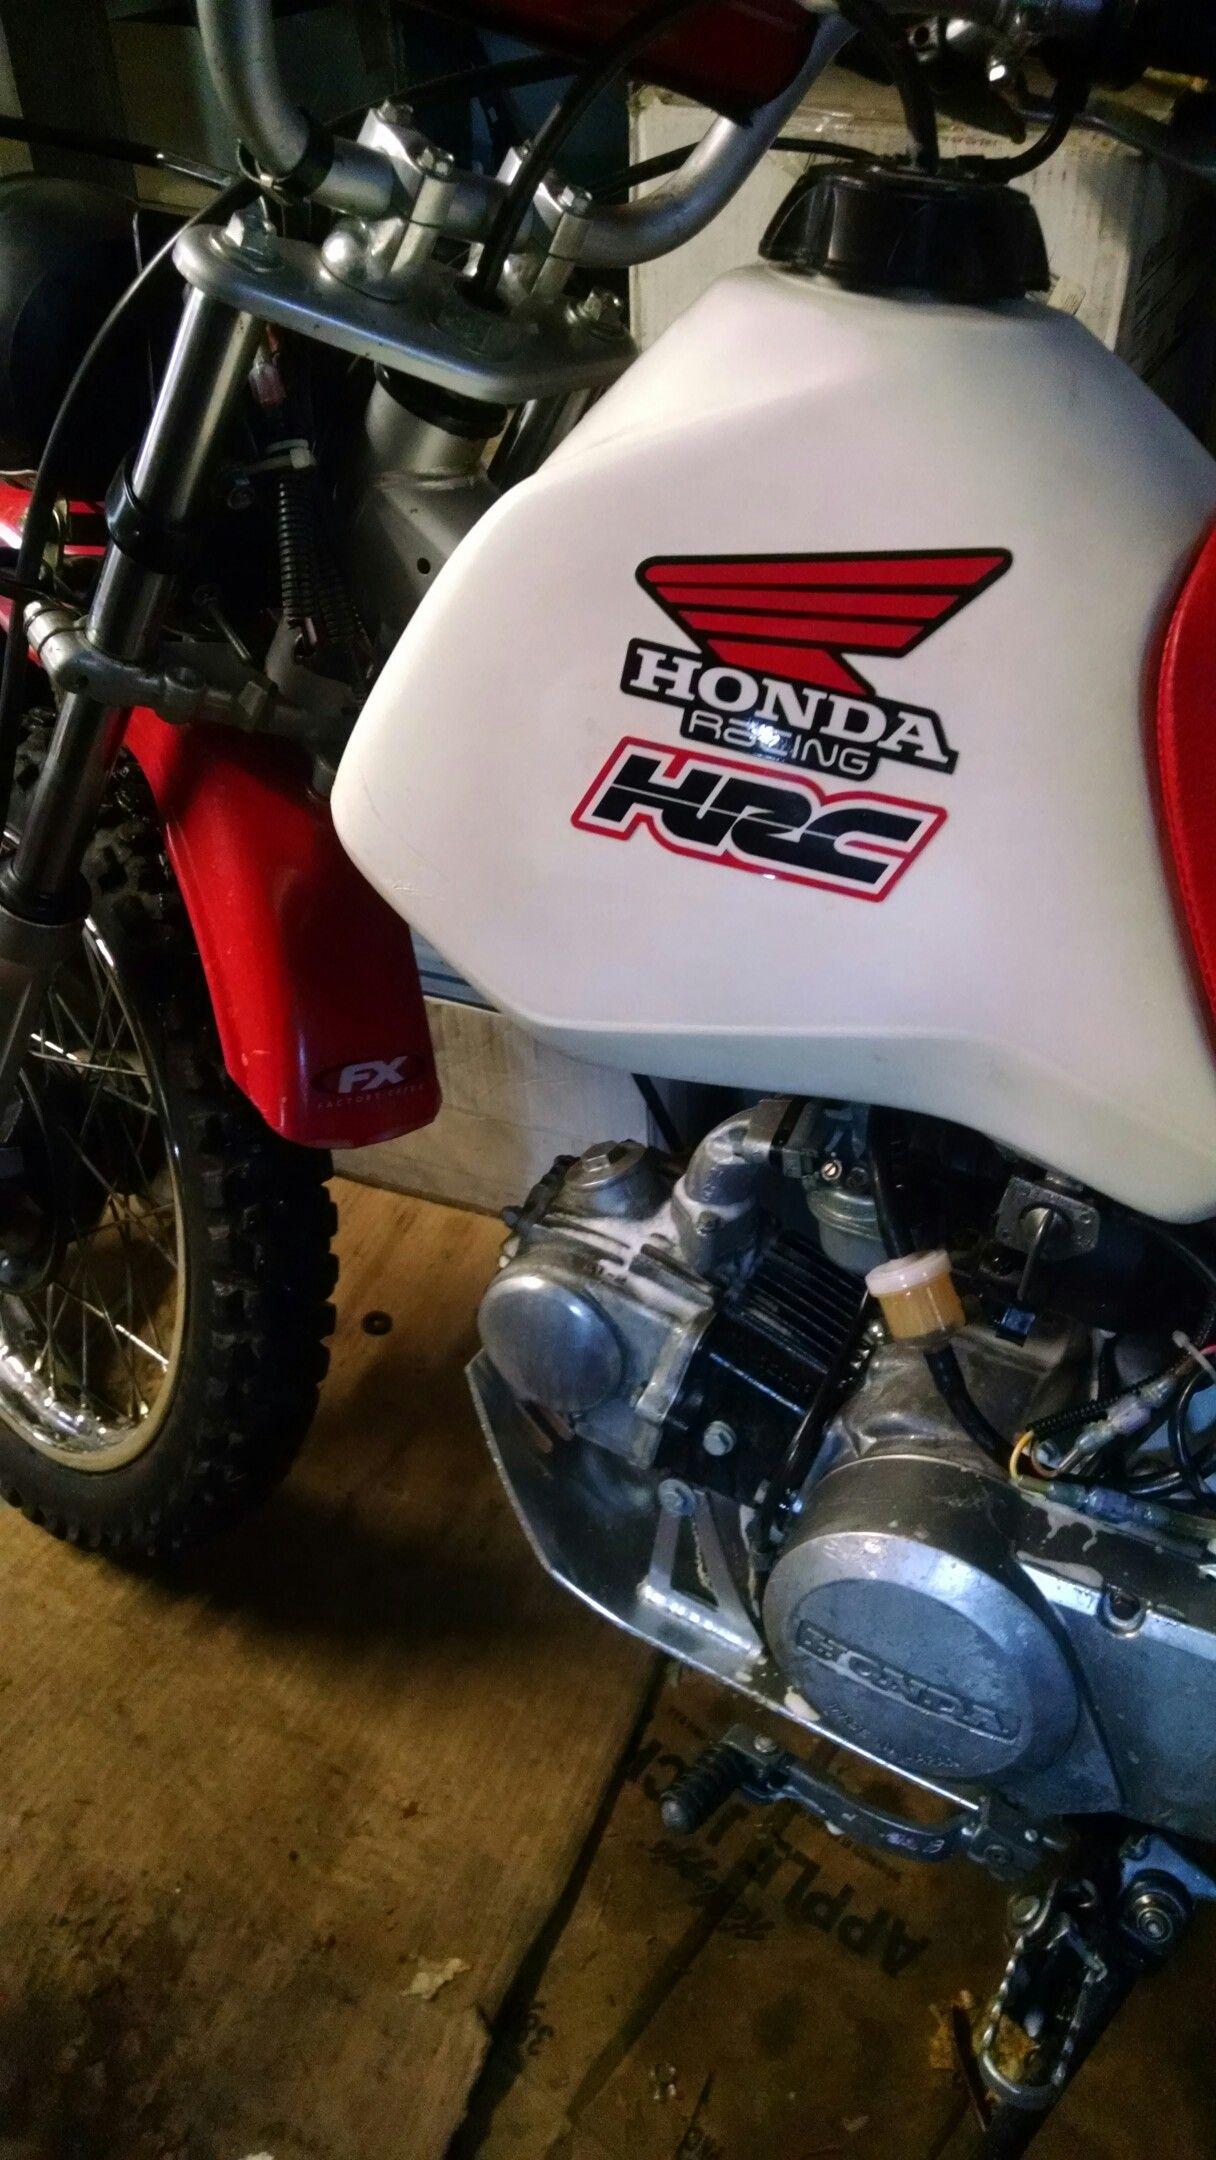 Honda racing company xr70 Honda, Racing, Auto Racing